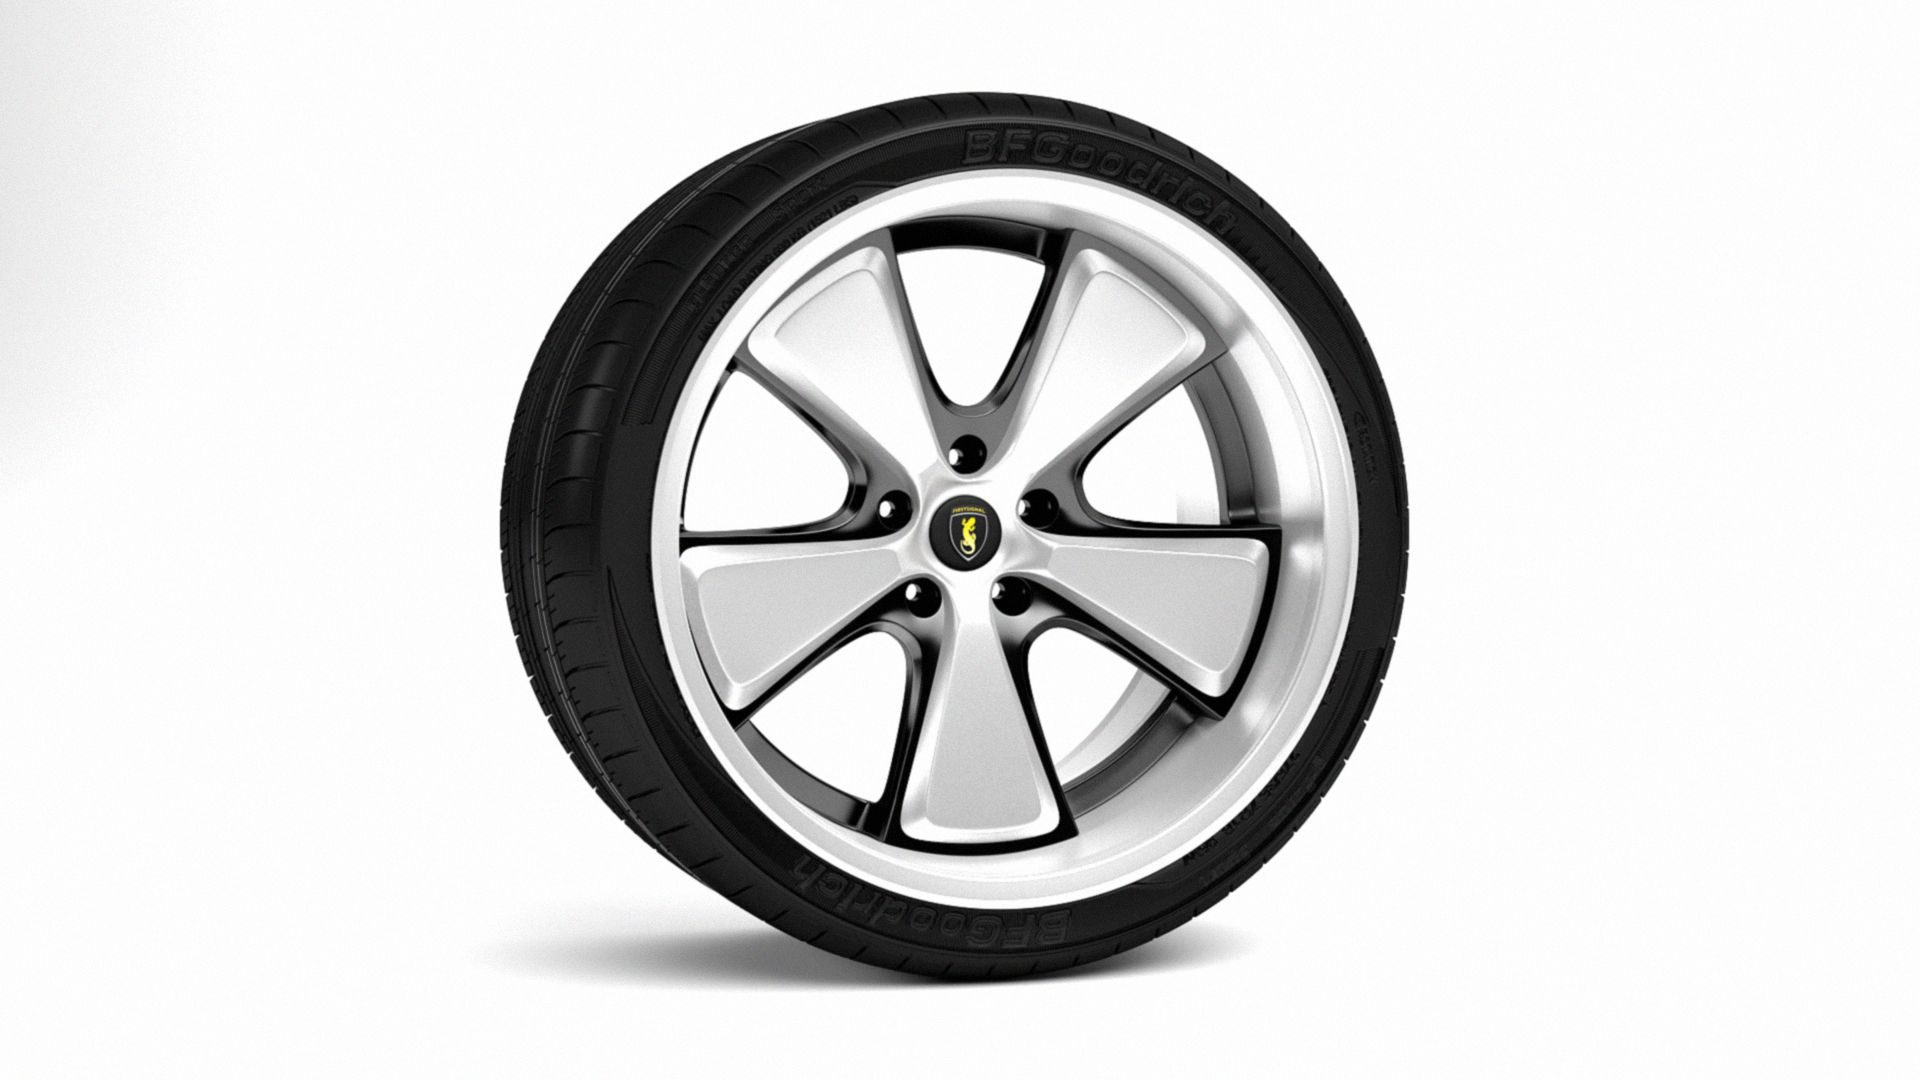 Wheel Design Concept For Porsche Fuchs Wheel Design Style 3 Piece Wheel 19 Inch And More This Is Not A Porsche Product